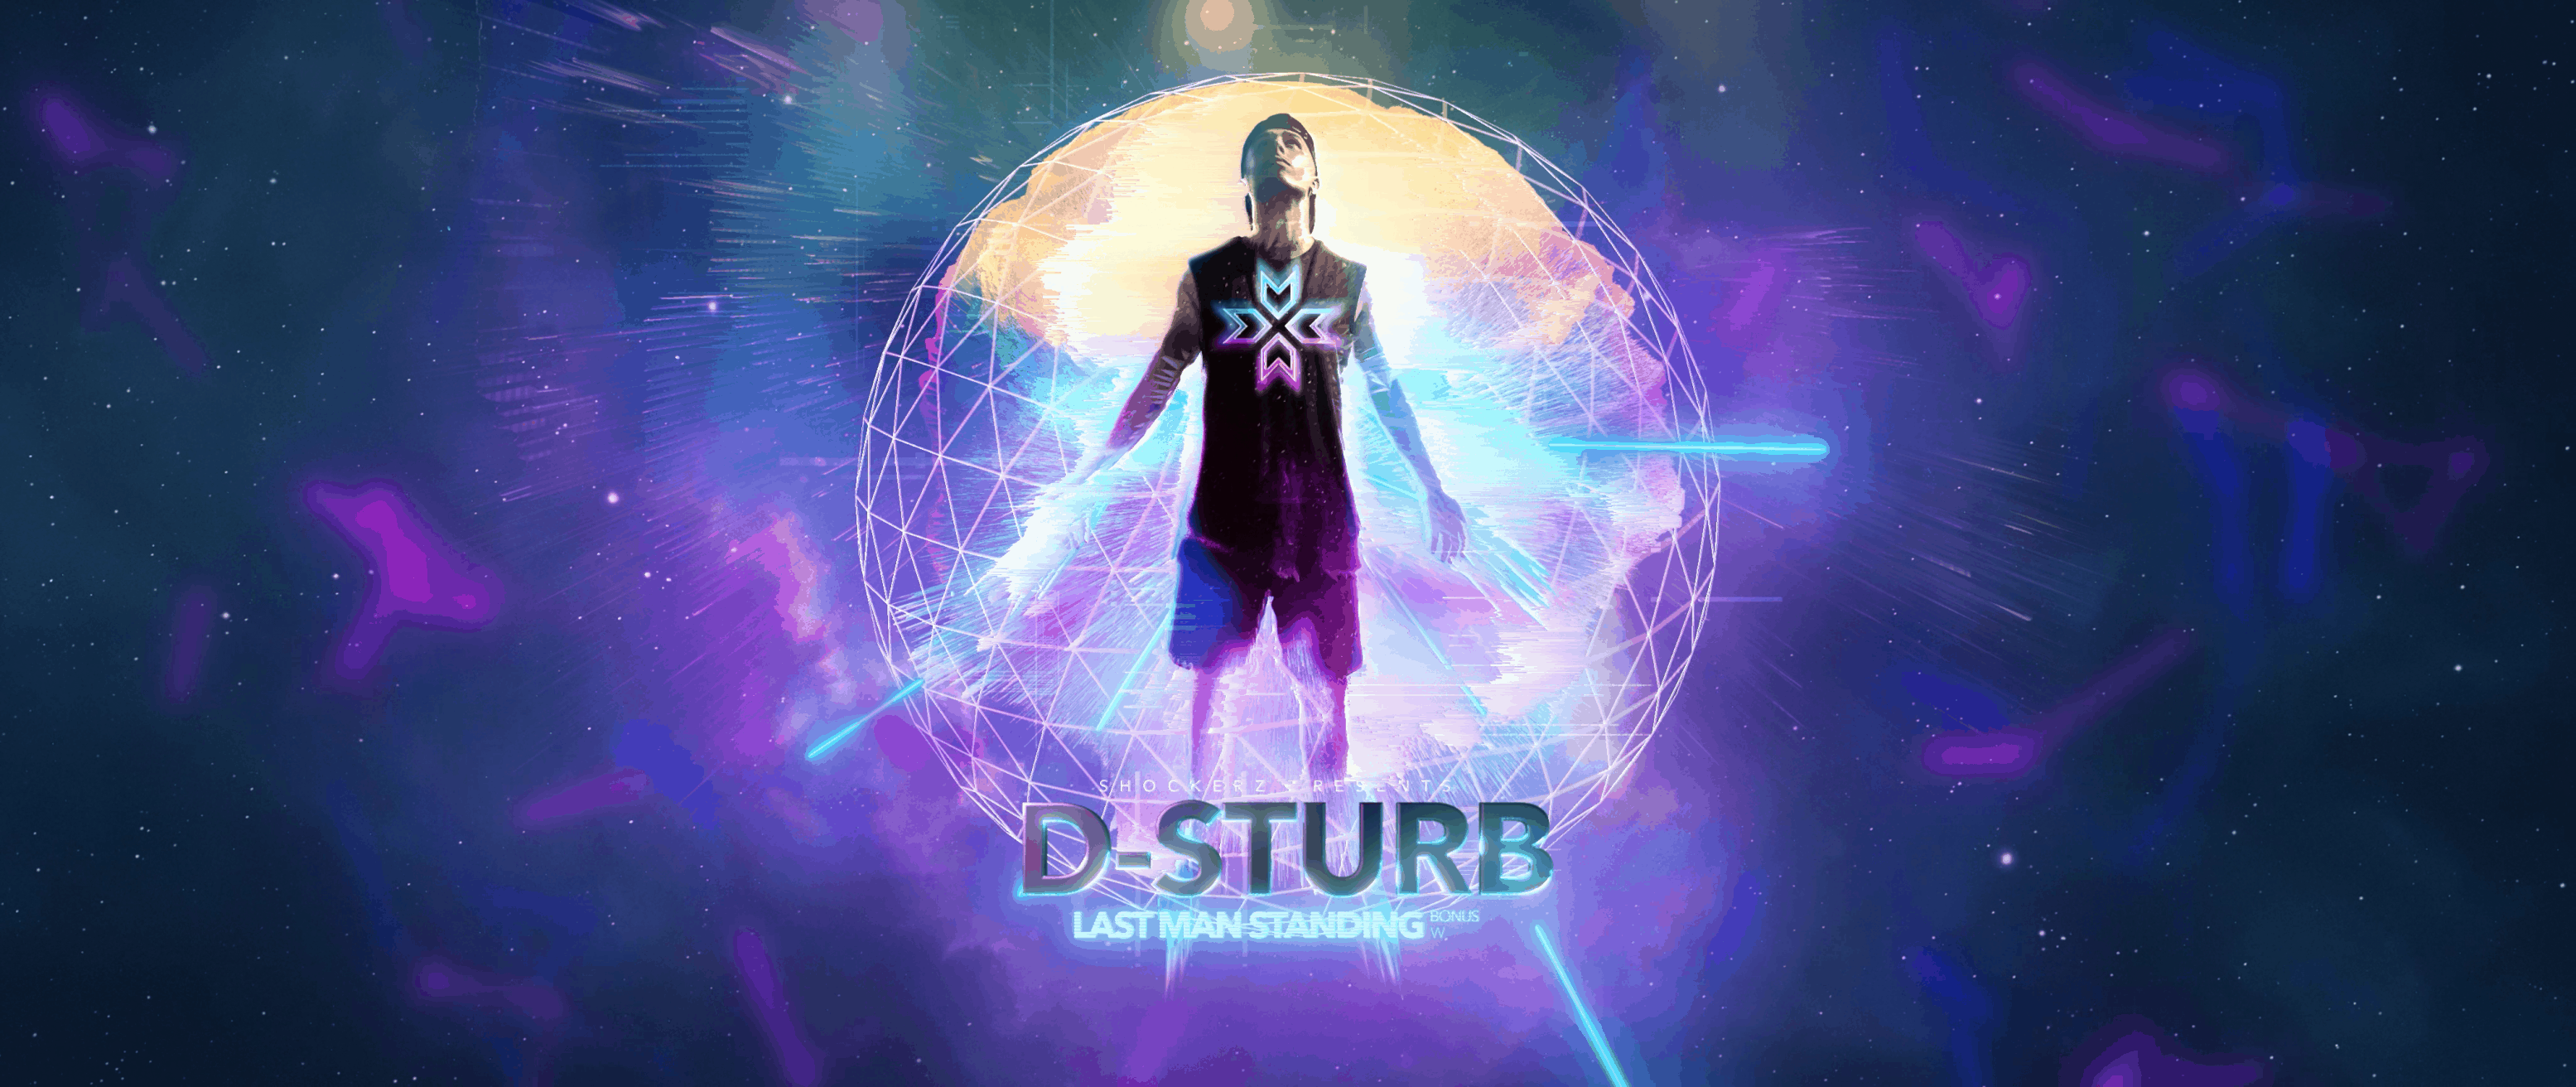 D-Sturb The Next Level Bonus Level Trailer